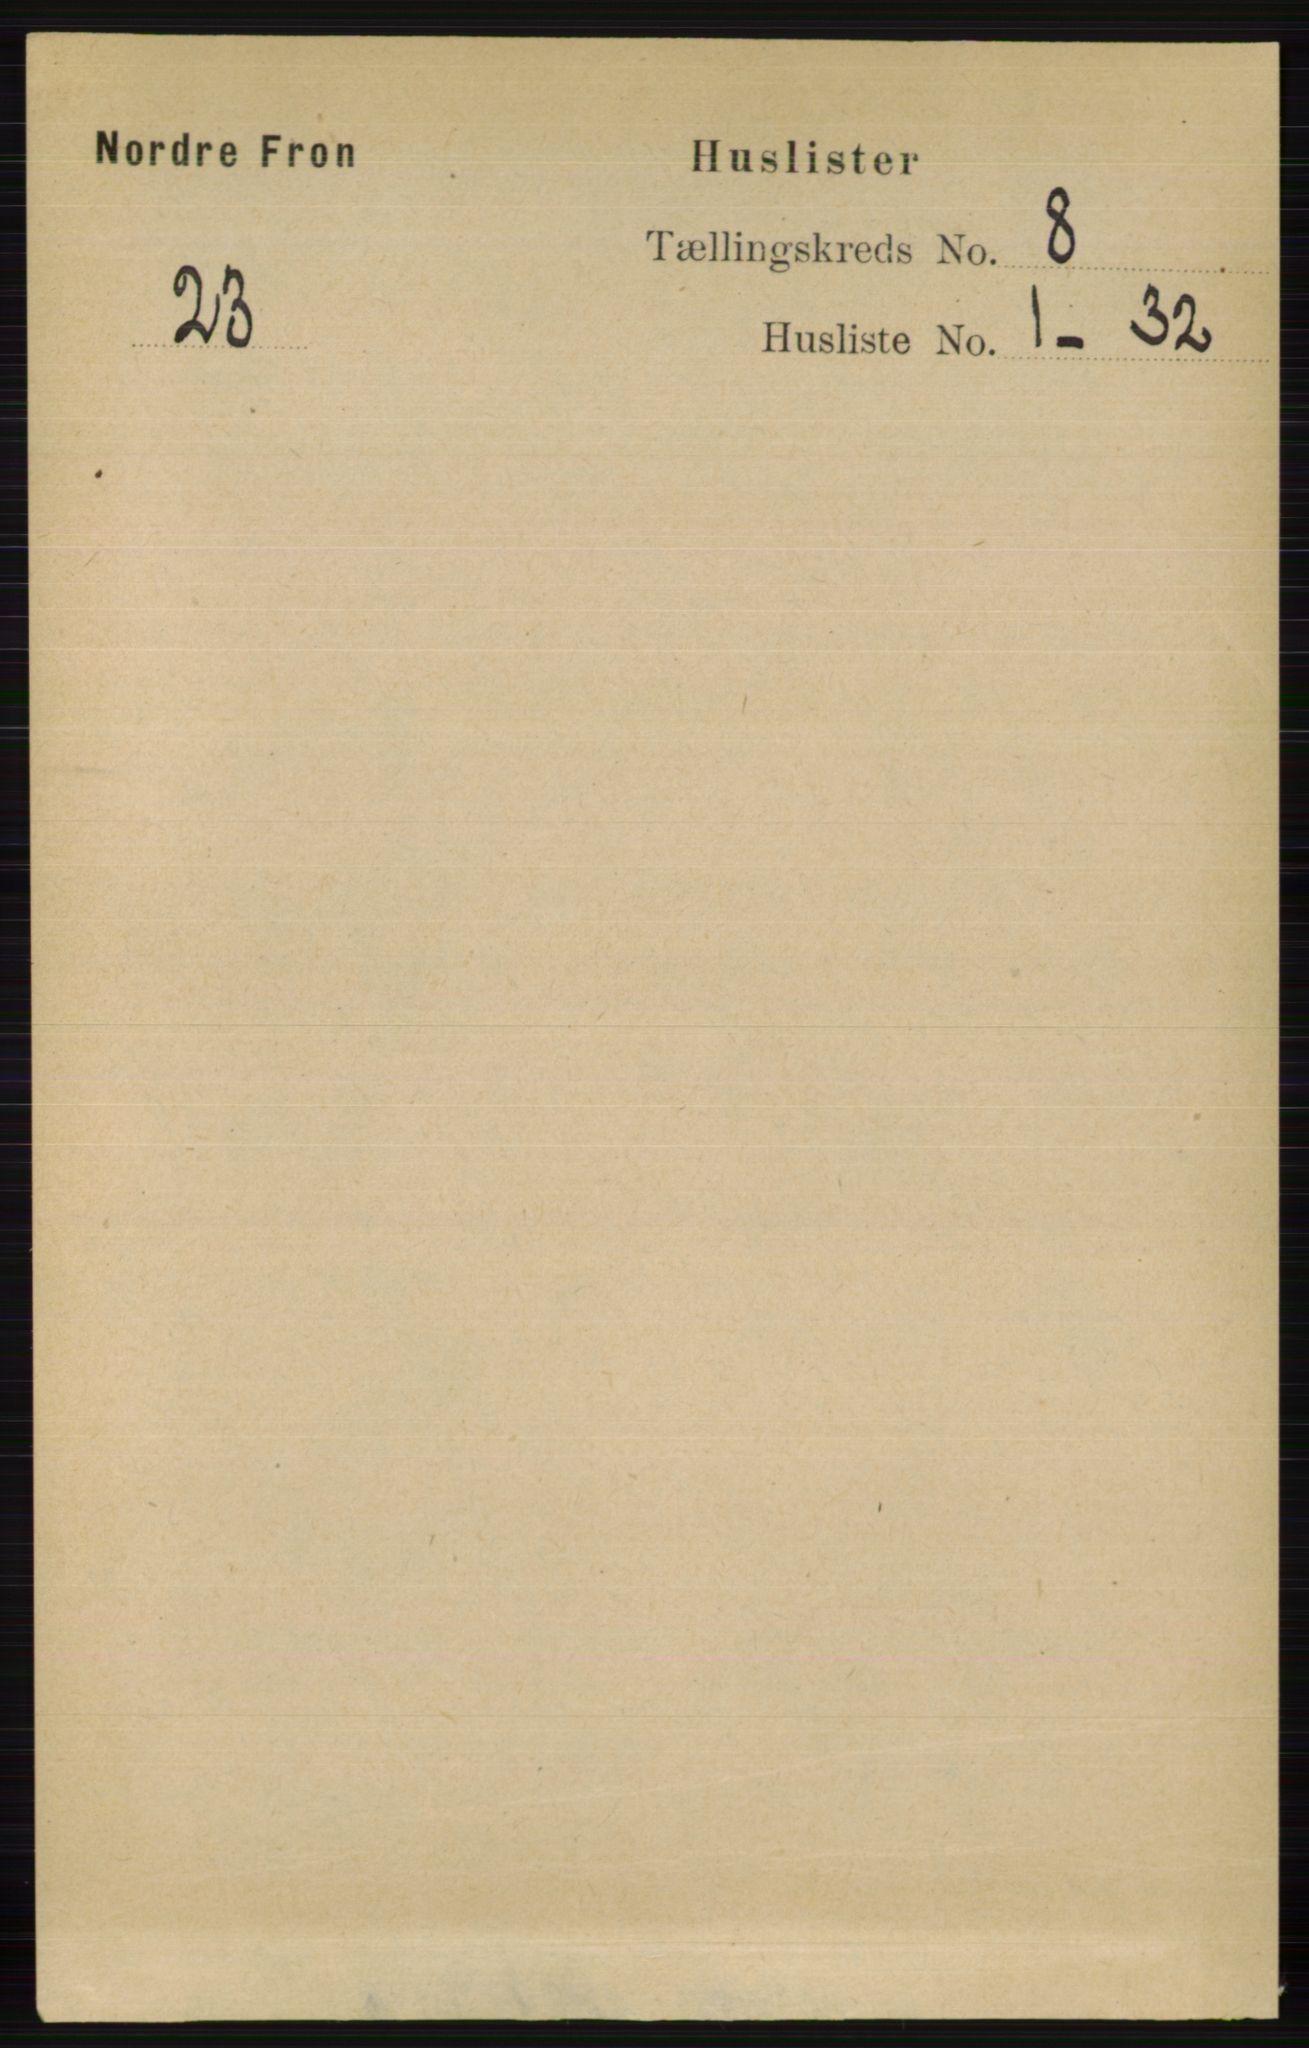 RA, Folketelling 1891 for 0518 Nord-Fron herred, 1891, s. 3379